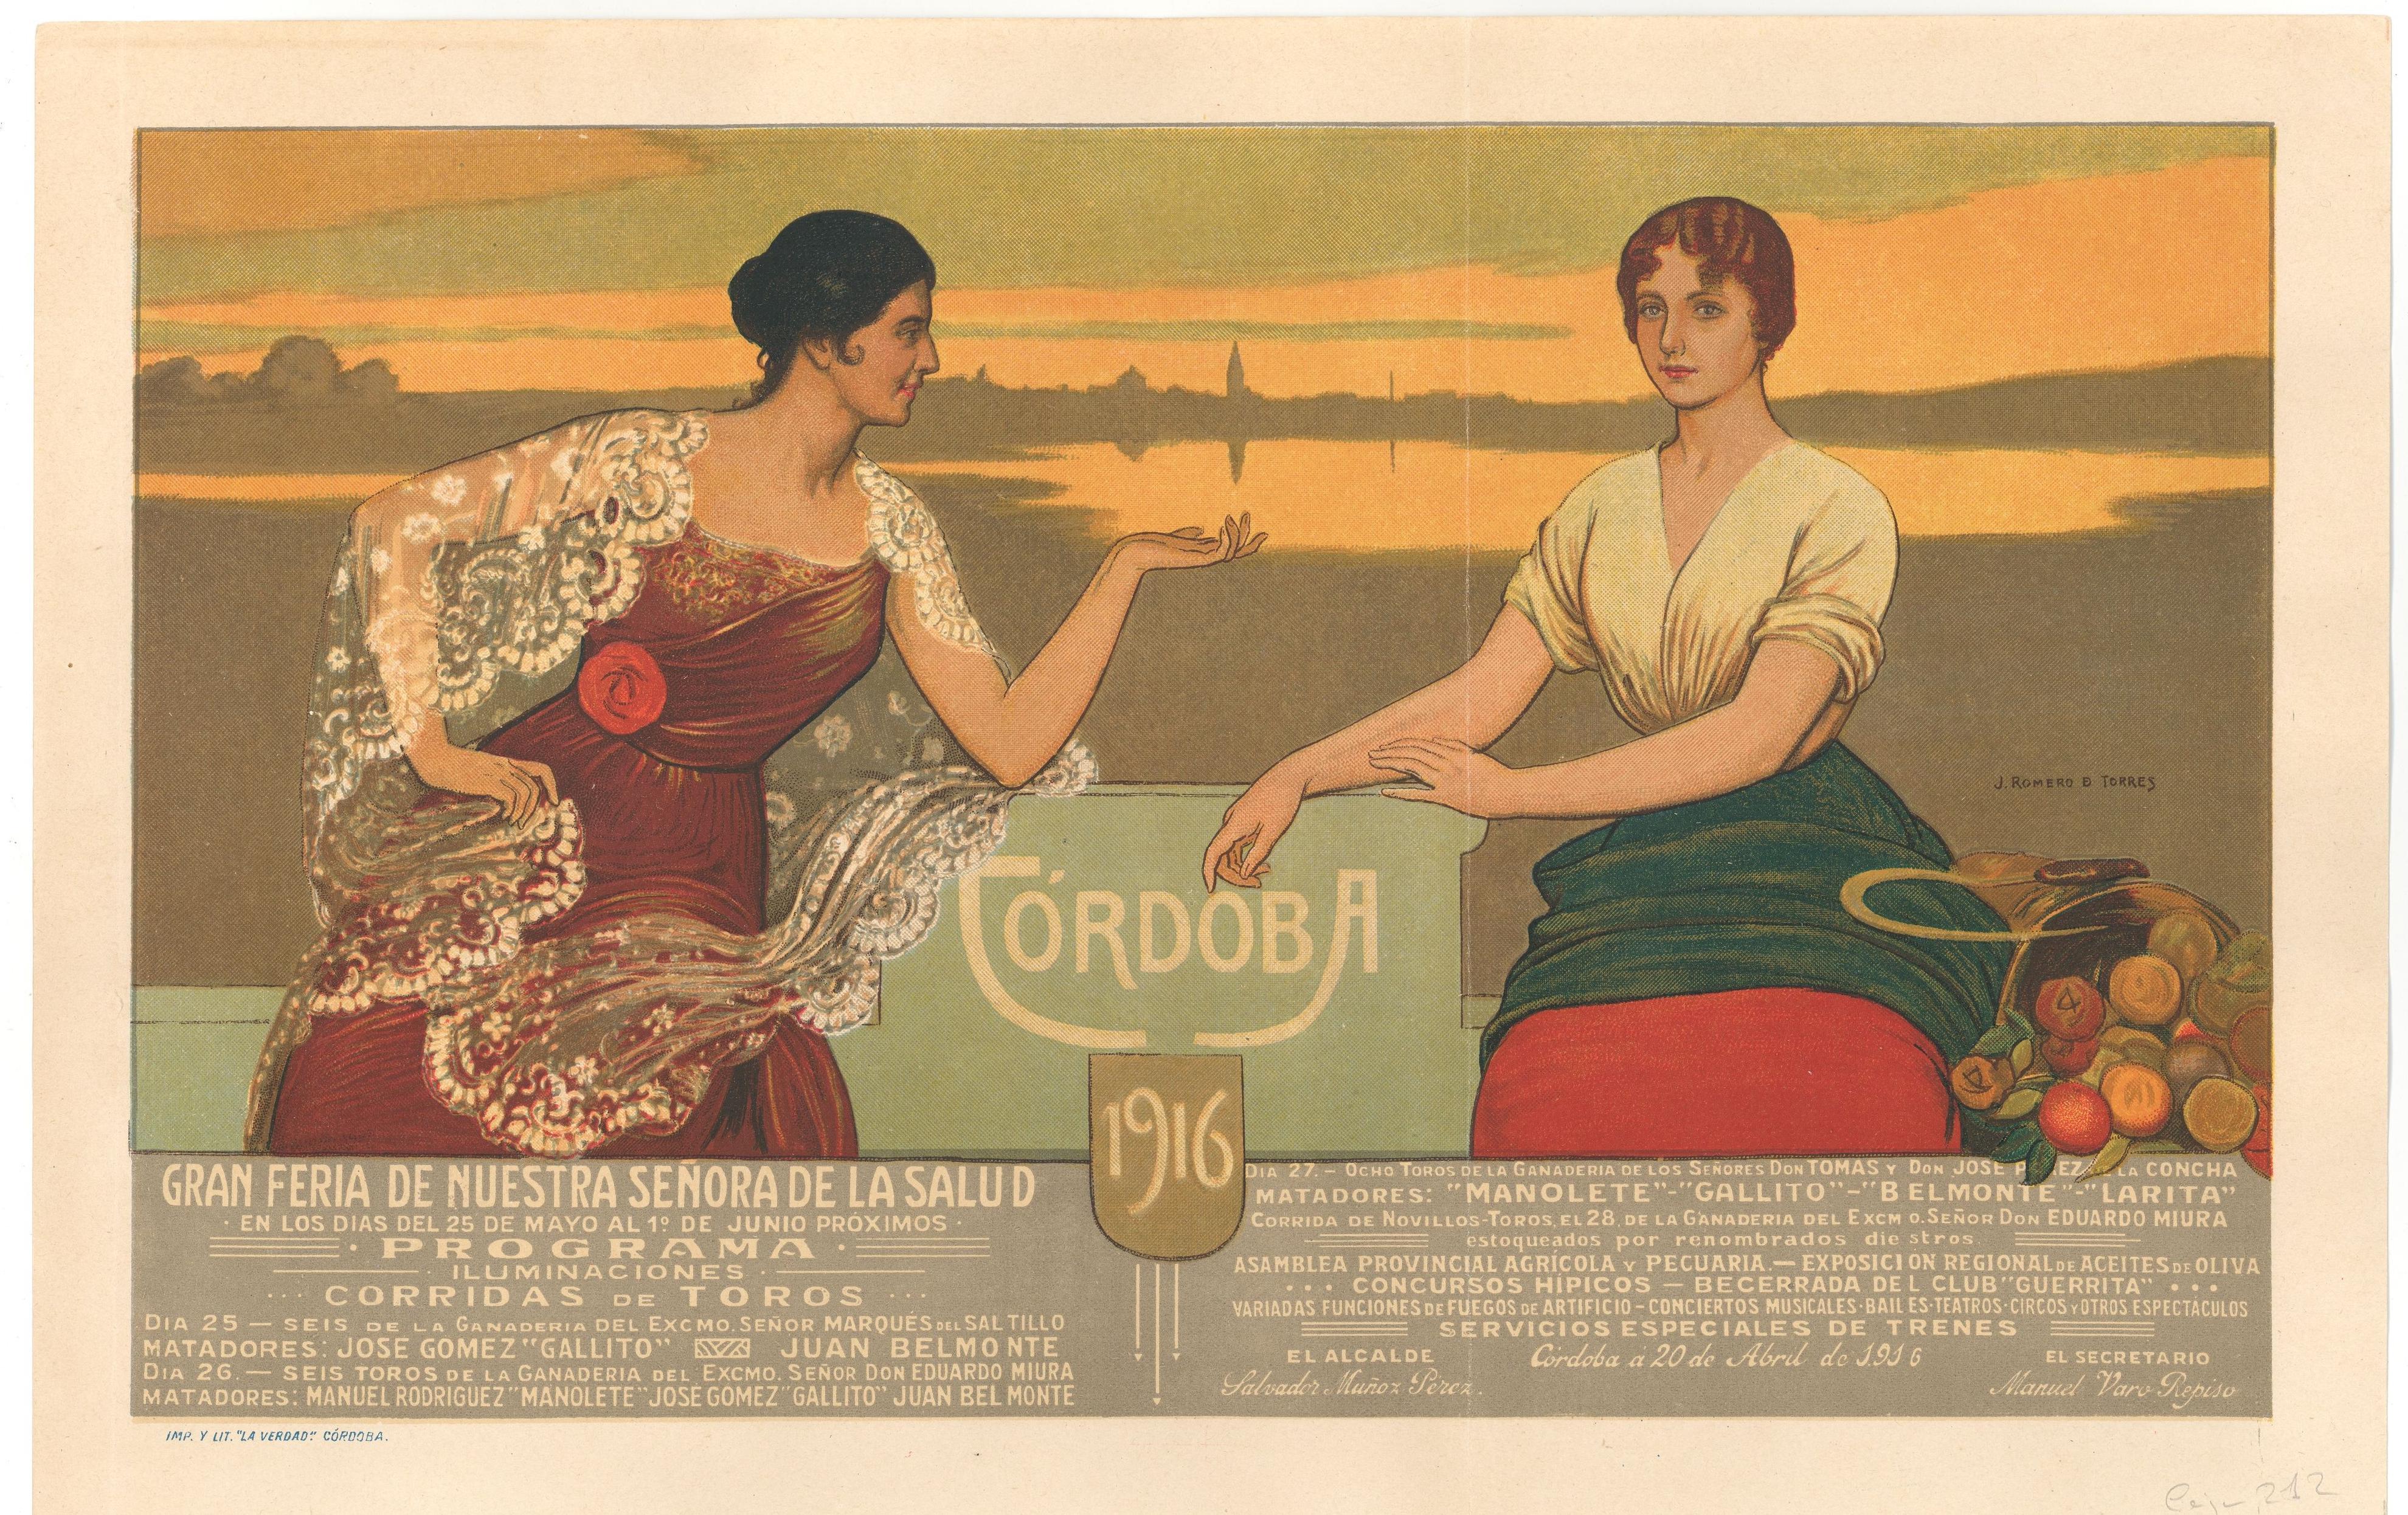 Cartel de la feria de Córdoba 1916